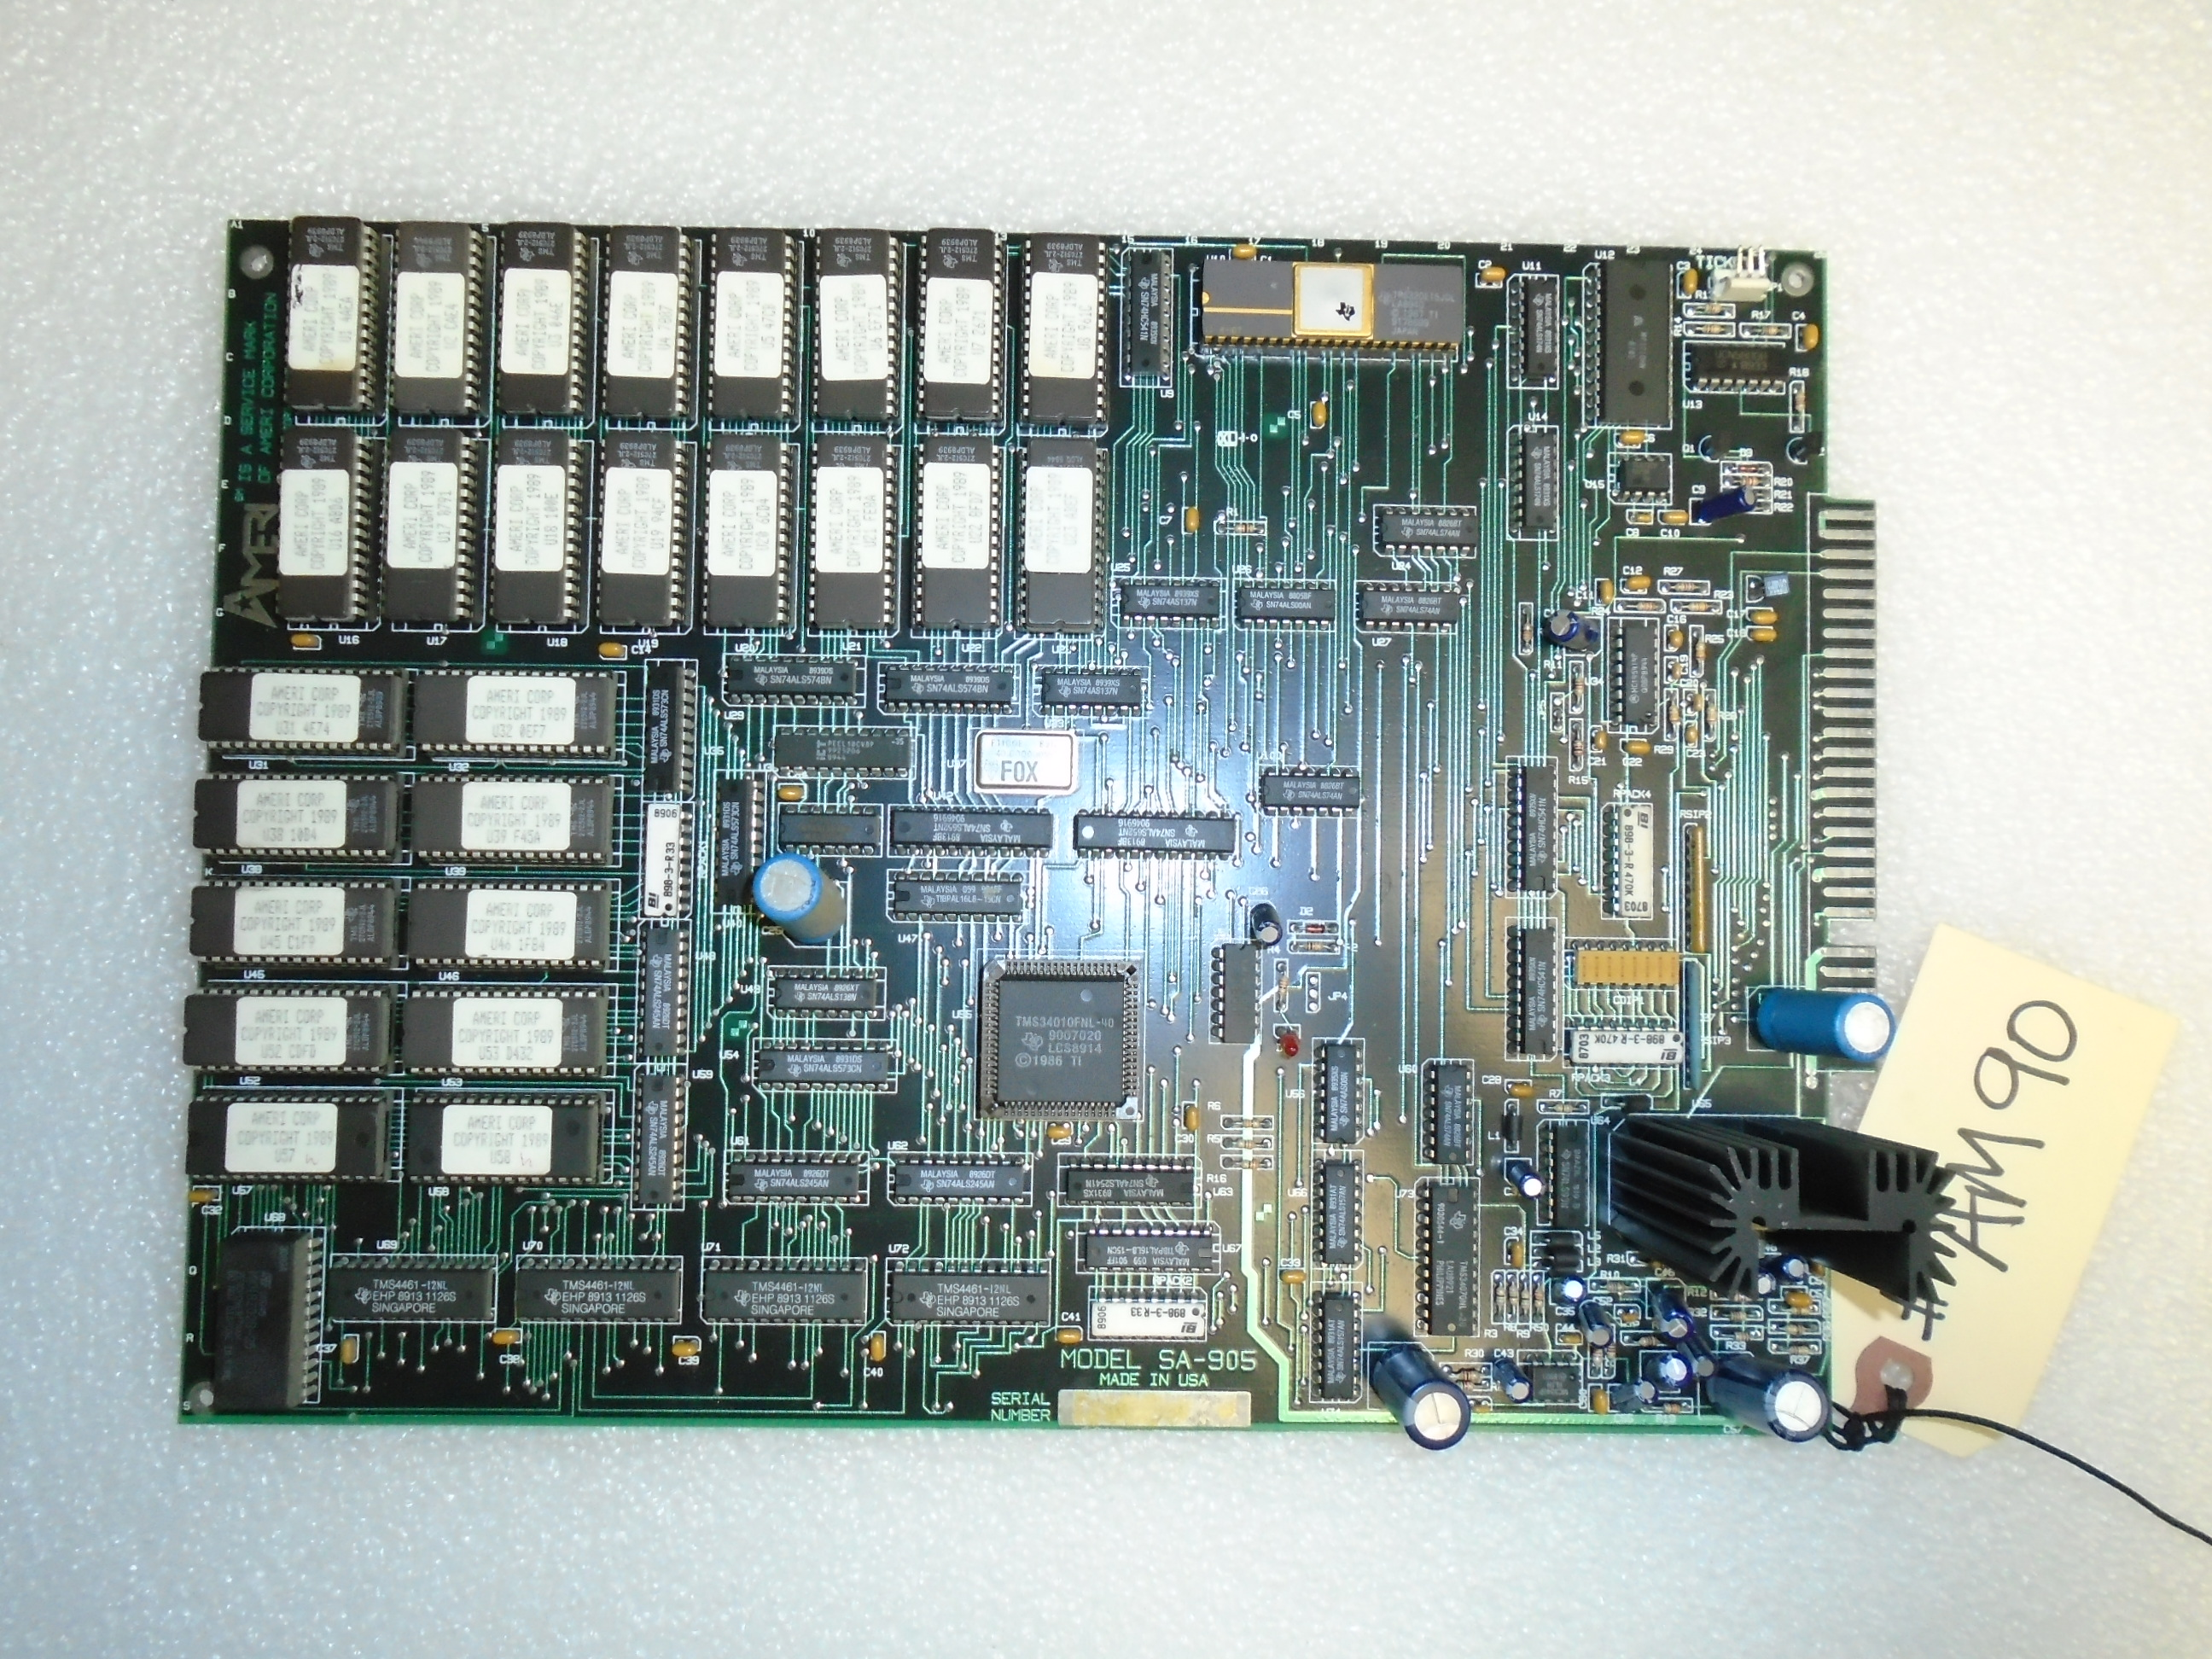 AMERIDARTS Arcade Machine Game PCB Printed Circuit JAMMA